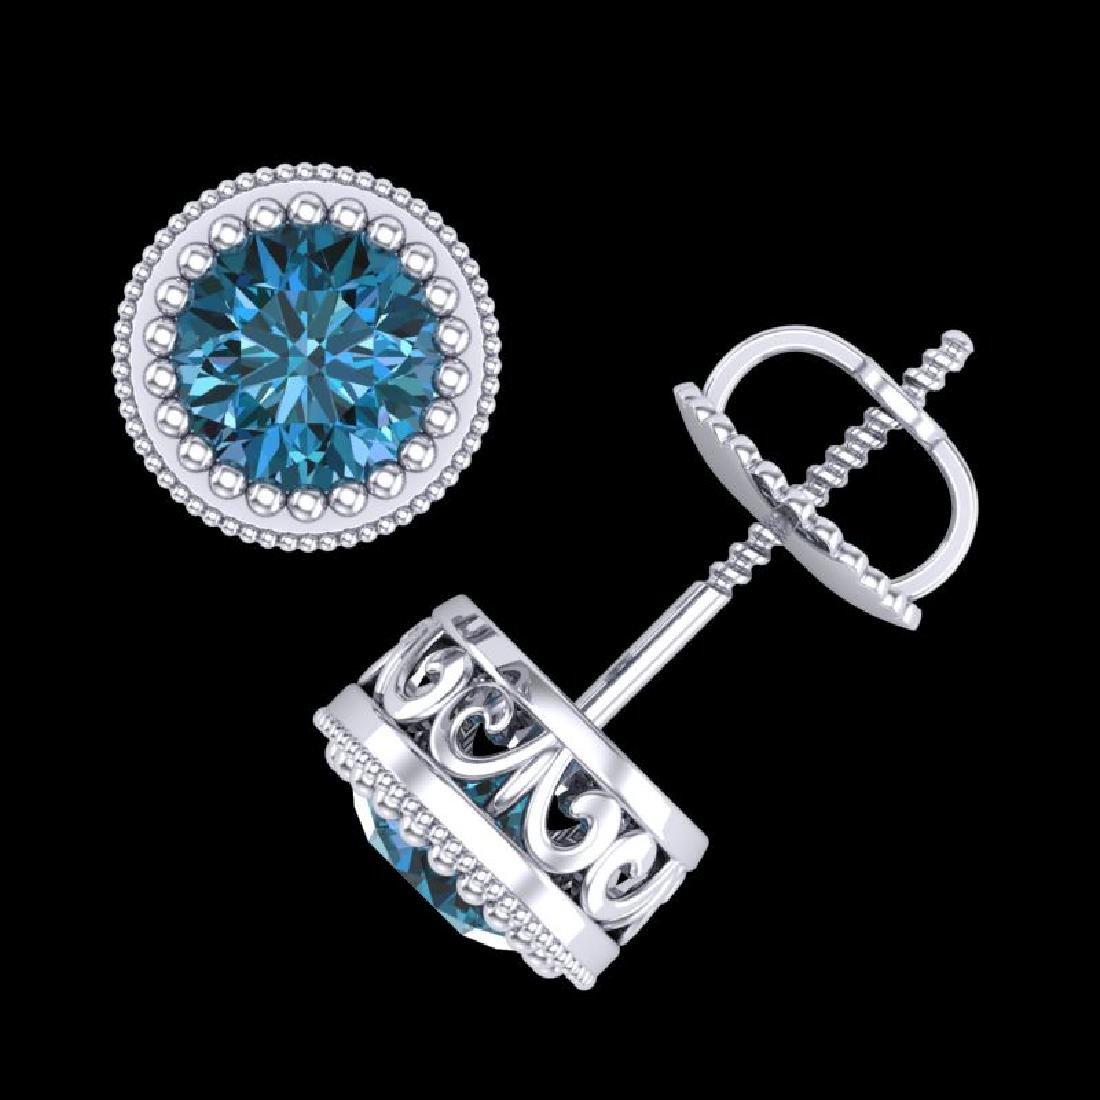 1.09 CTW Fancy Intense Blue Diamond Art Deco Stud - 3